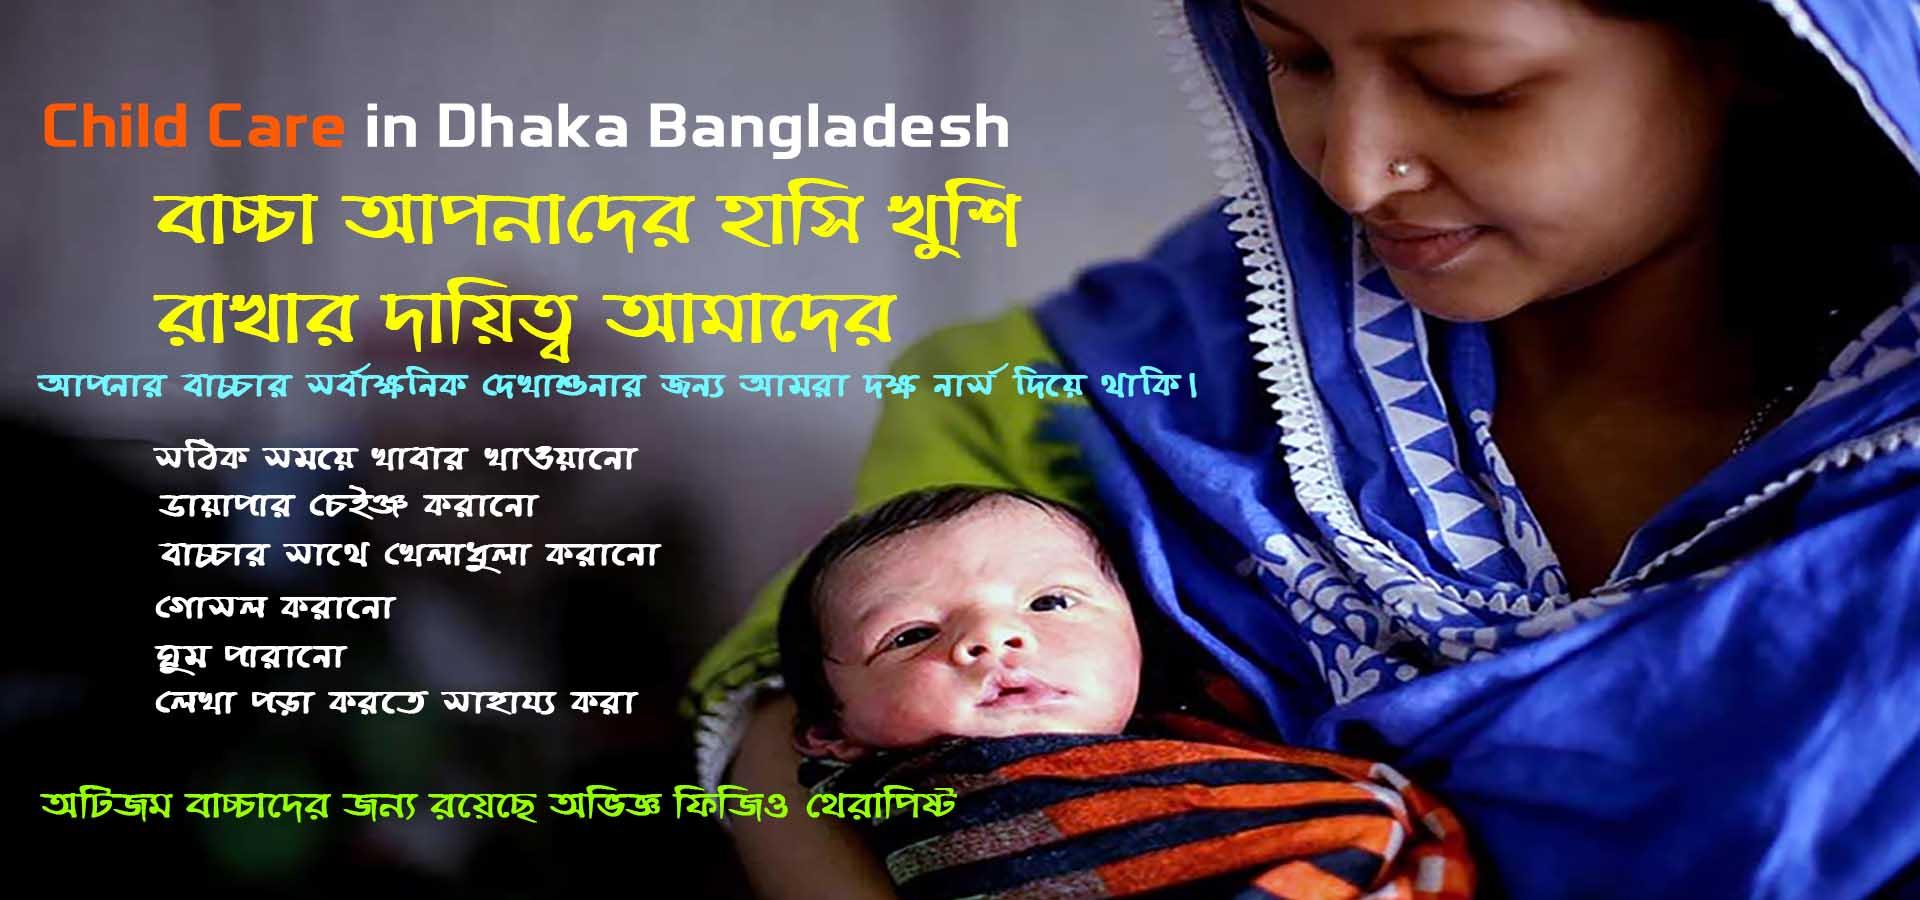 Child Care in Dhaka Bangladesh